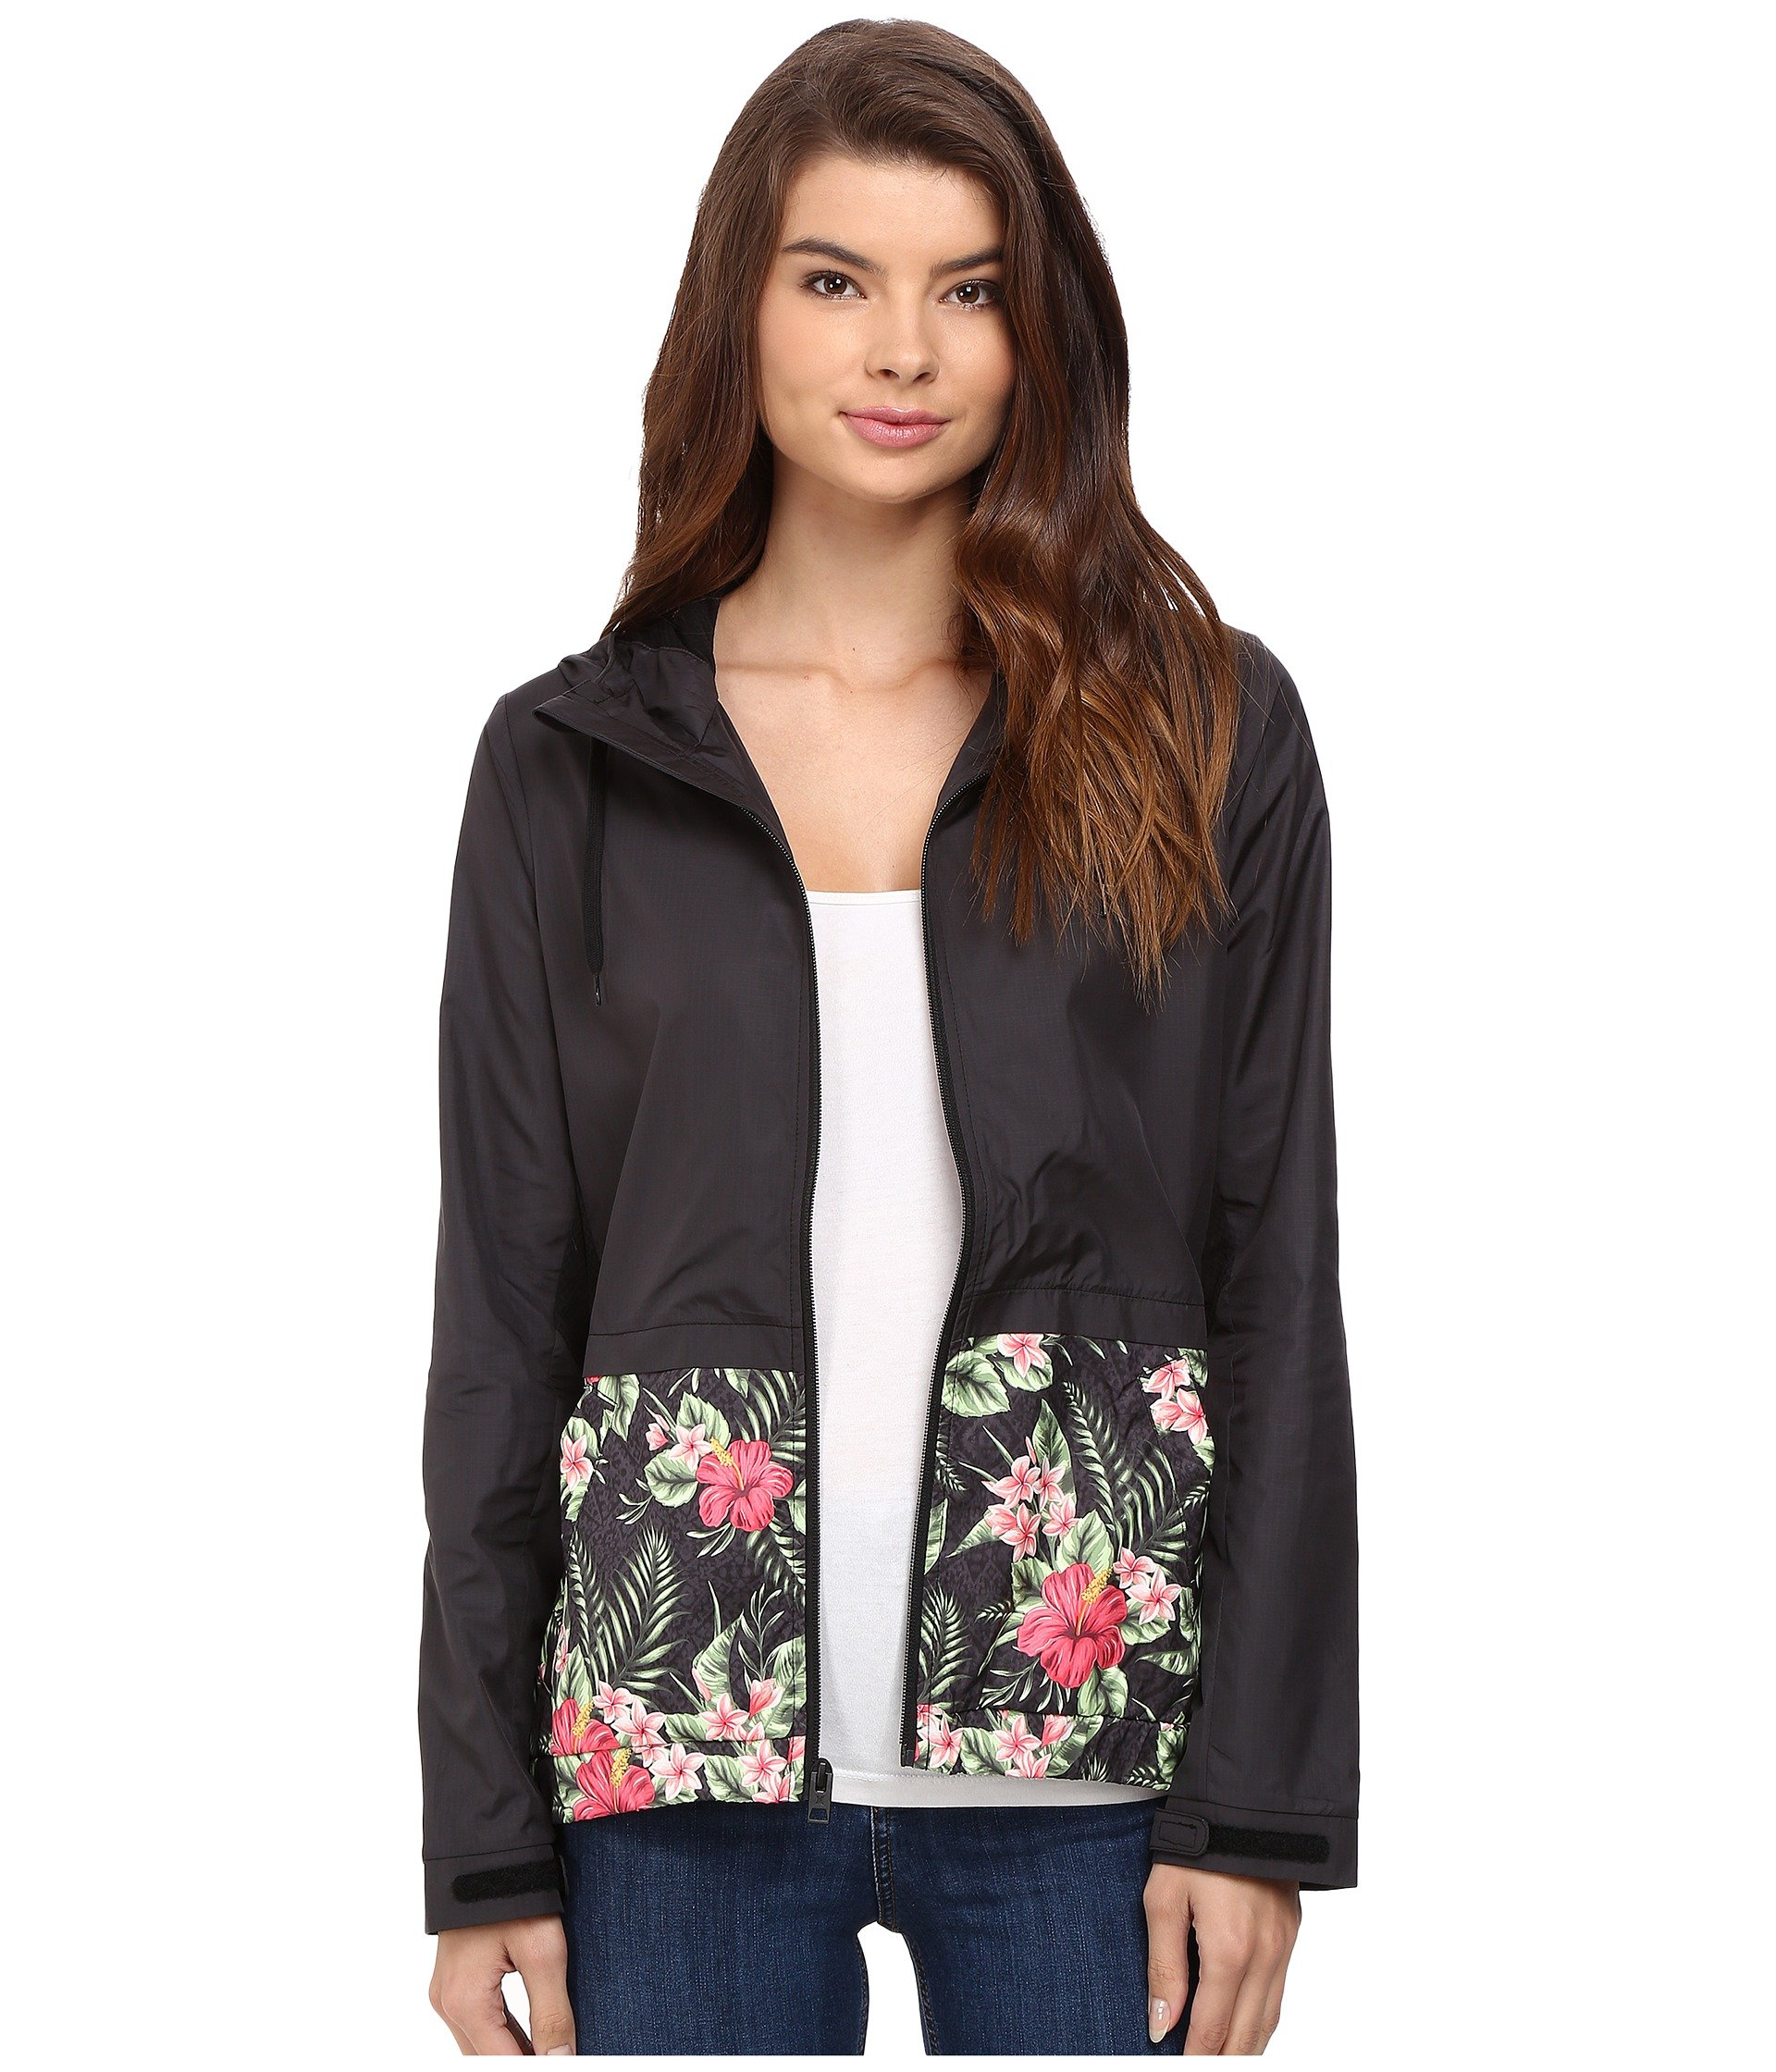 Hurley Women's Blocked Runner Jacket Black Floral Jacket MD (US 7-9)